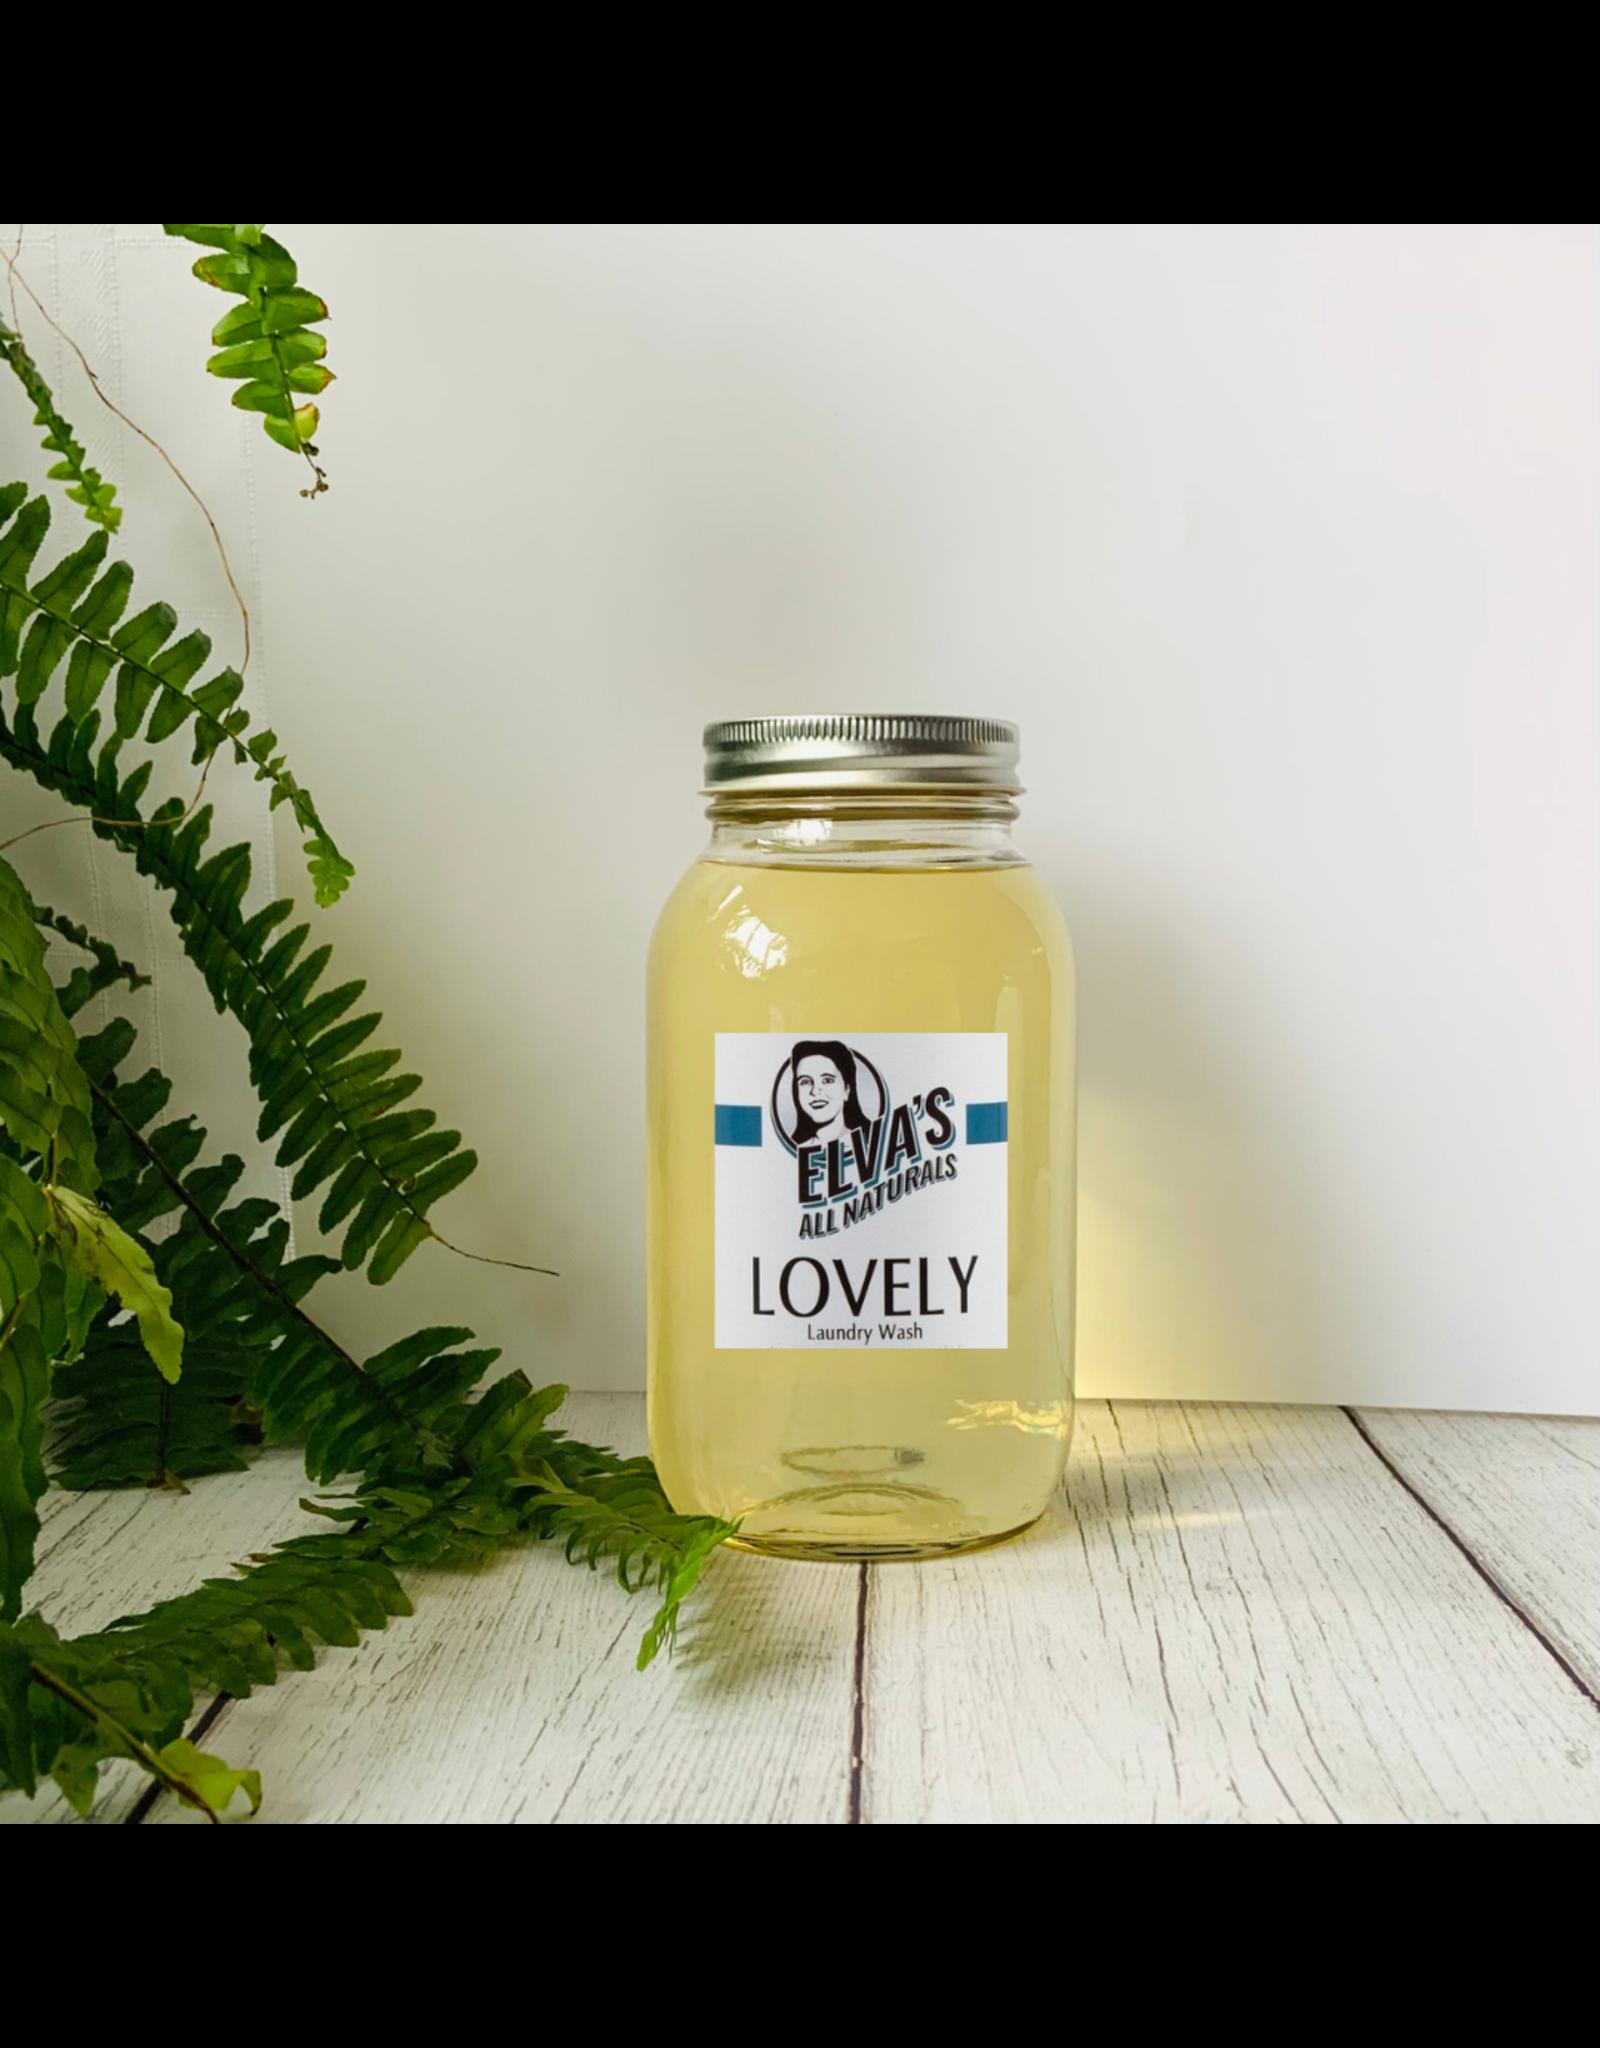 Elva's All Naturals HomeFill - Liquid LOVELY Laundry Detergent by Elva's All Naturals